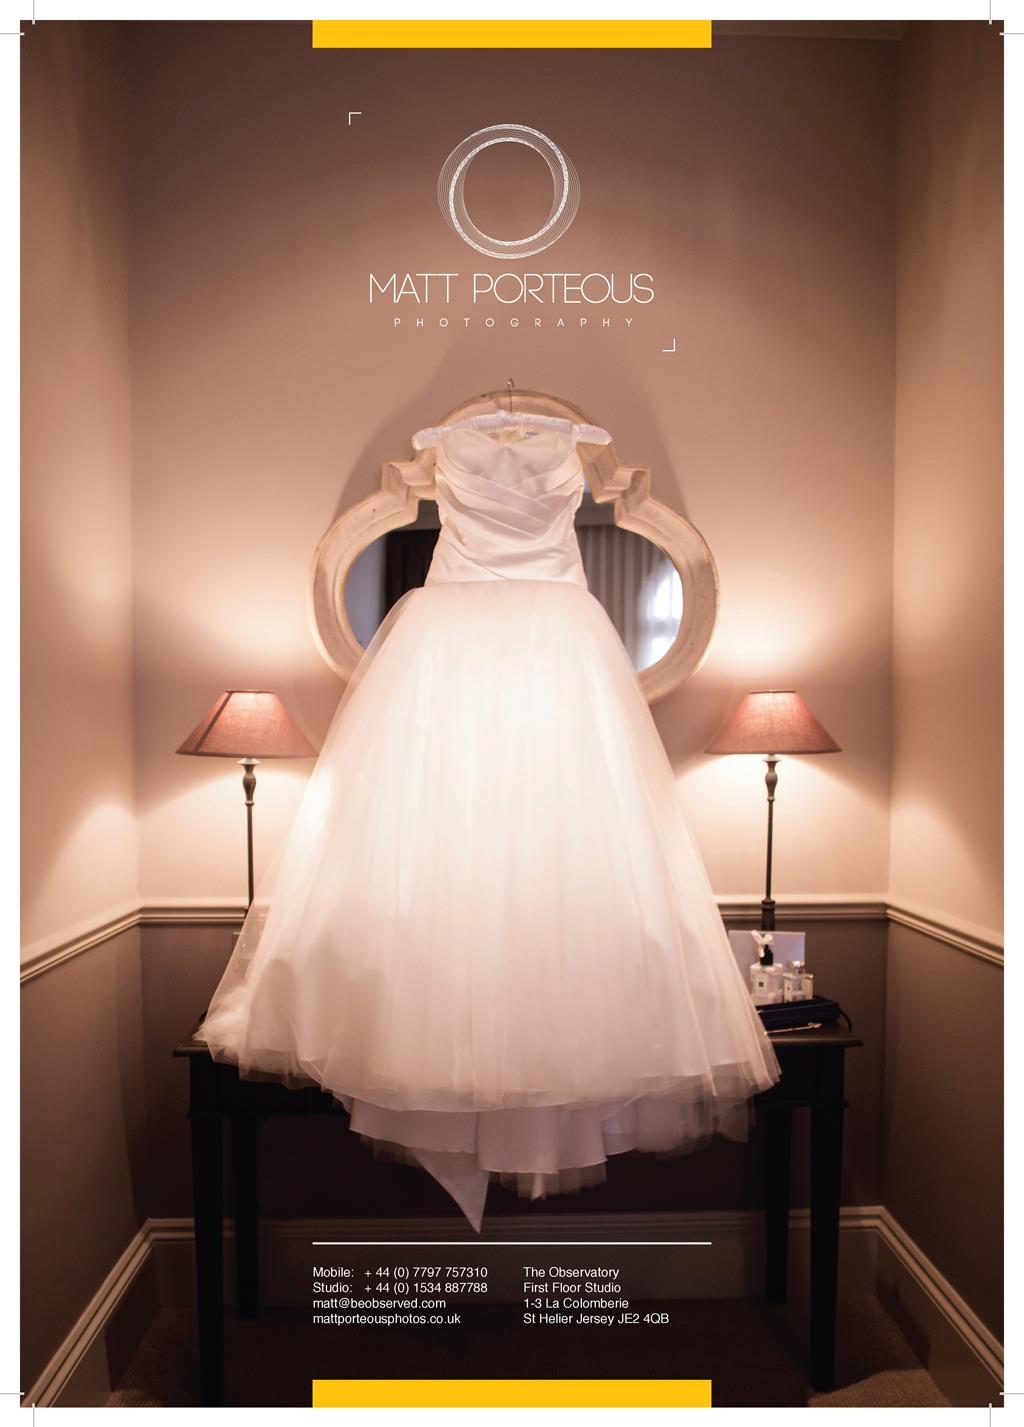 Matt Porteous Photography